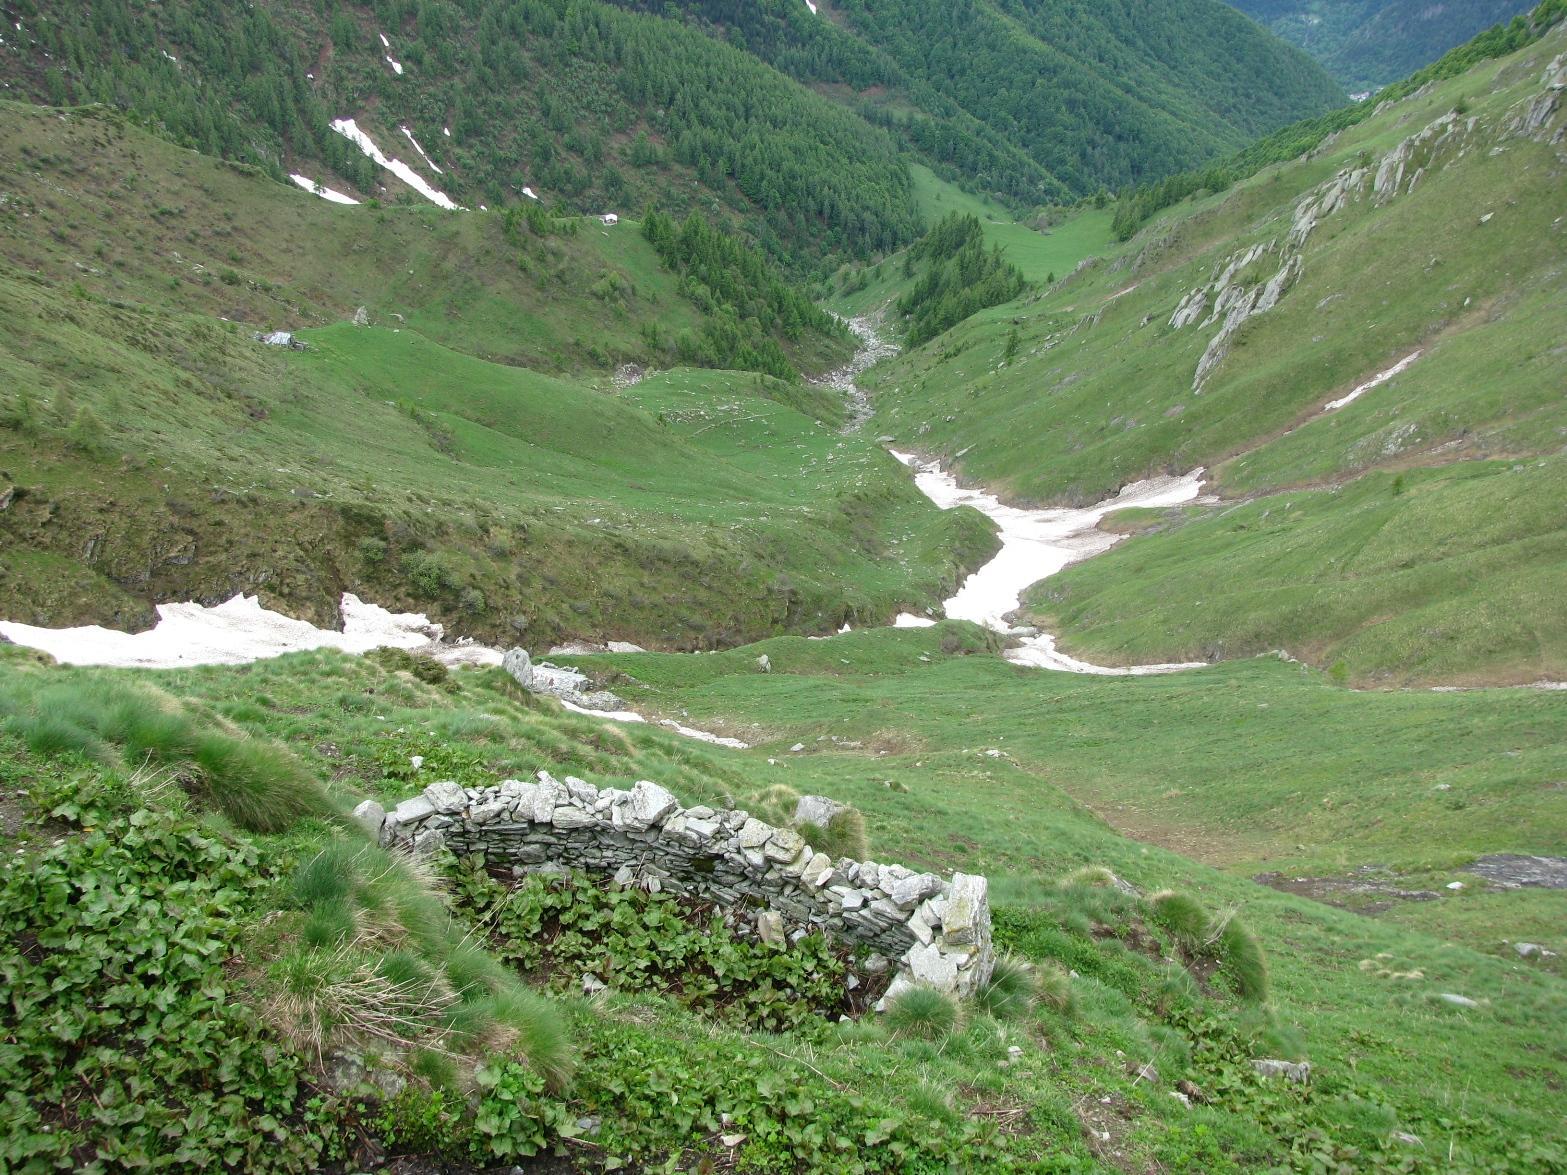 Sguardo a valle dalla baita Sassetto